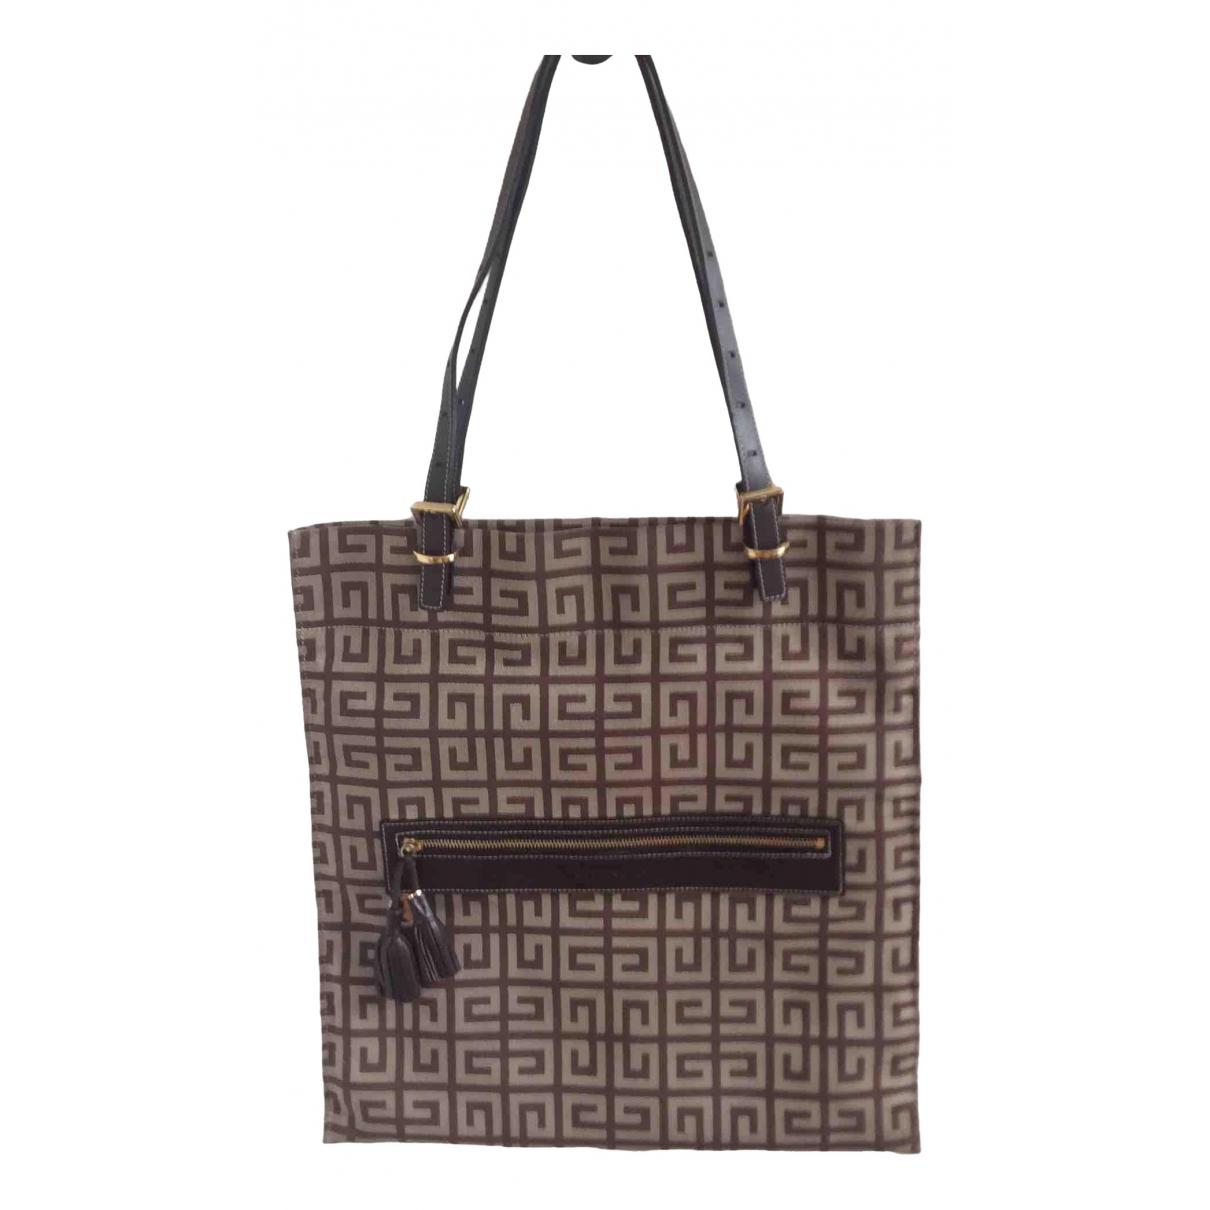 Givenchy \N Brown Cloth handbag for Women \N